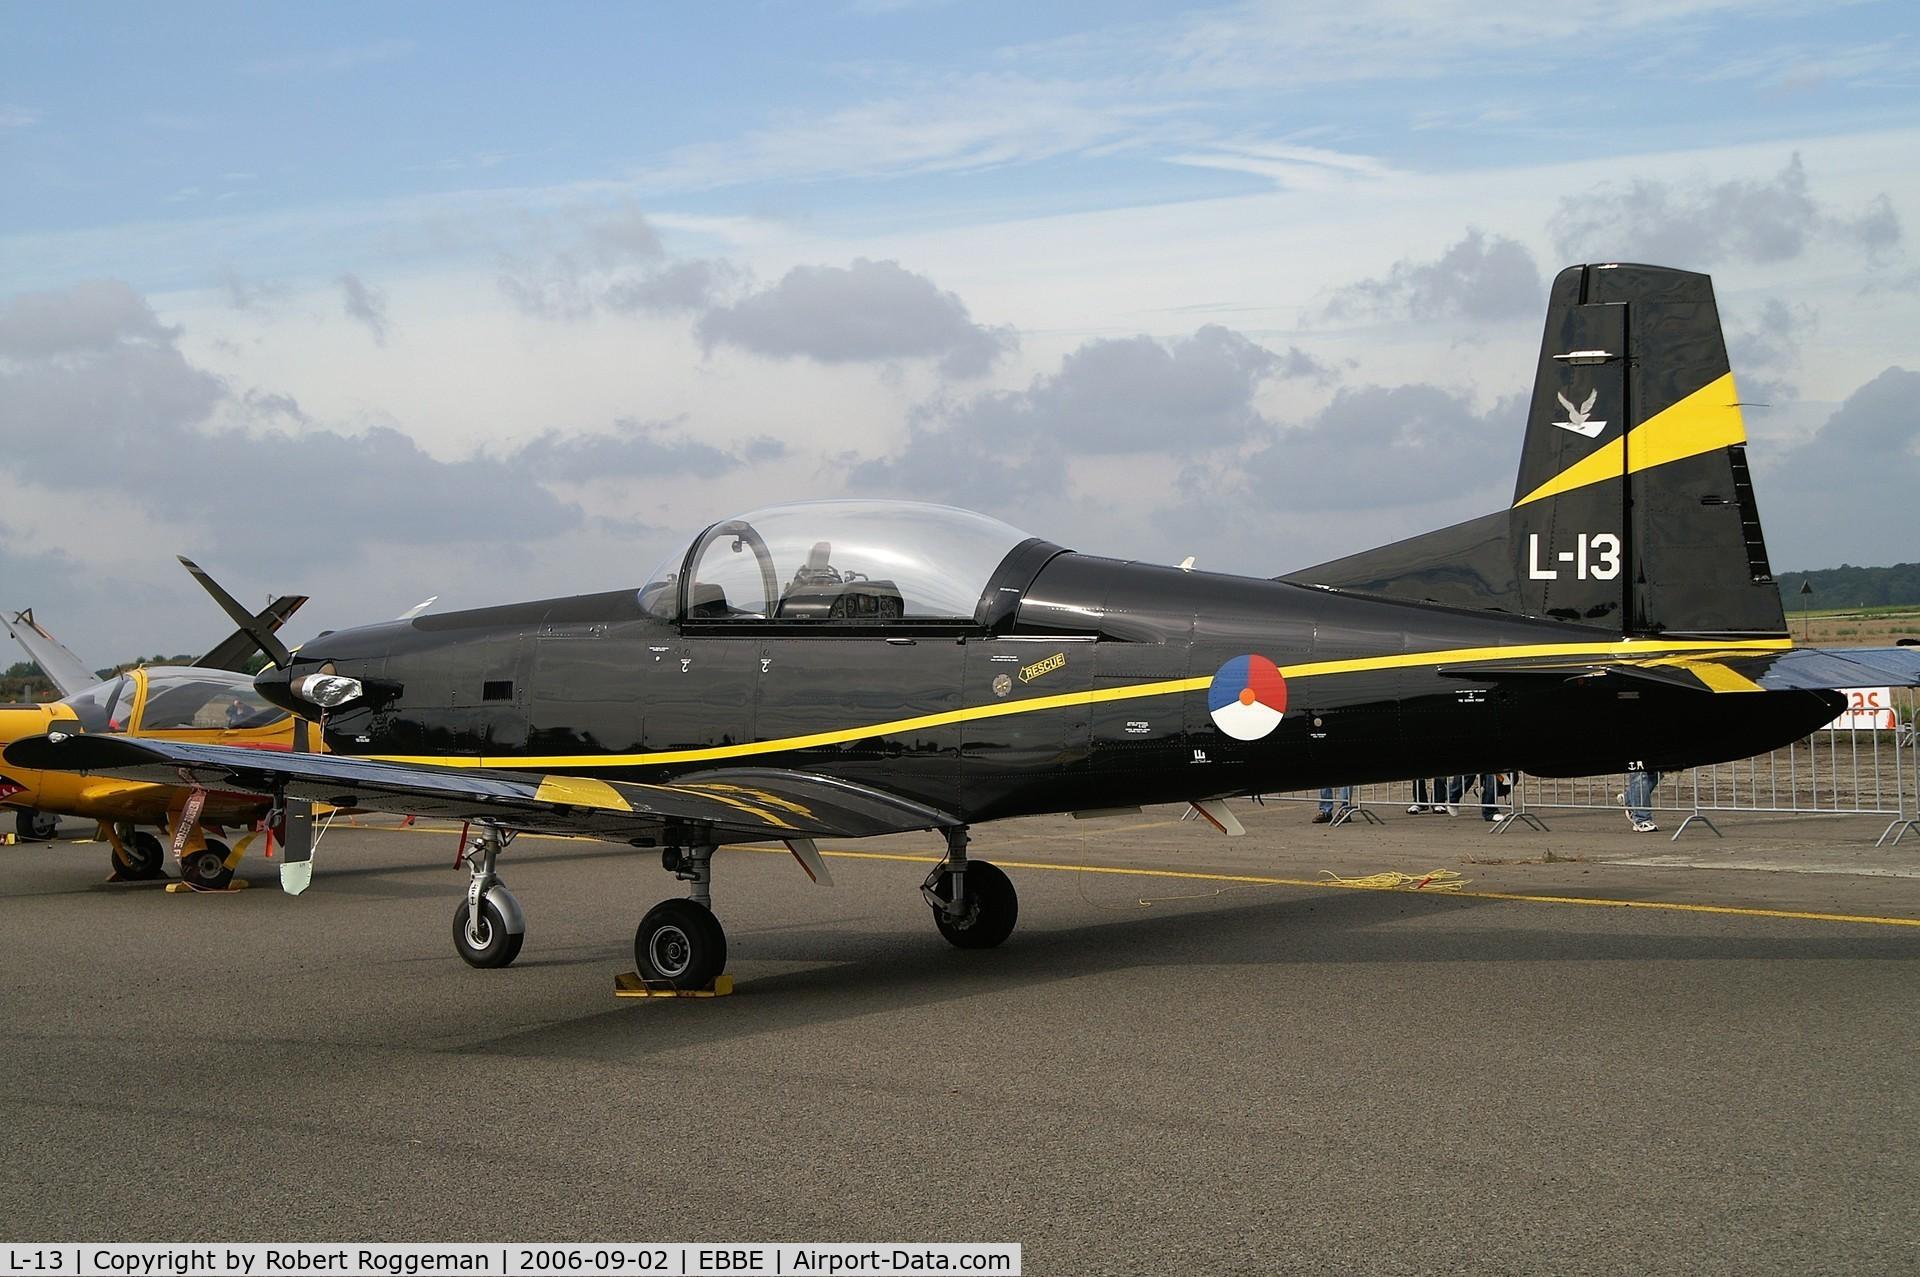 L-13, 1999 Pilatus PC-7 Turbo Trainer C/N 612, DEFENCE DAY.